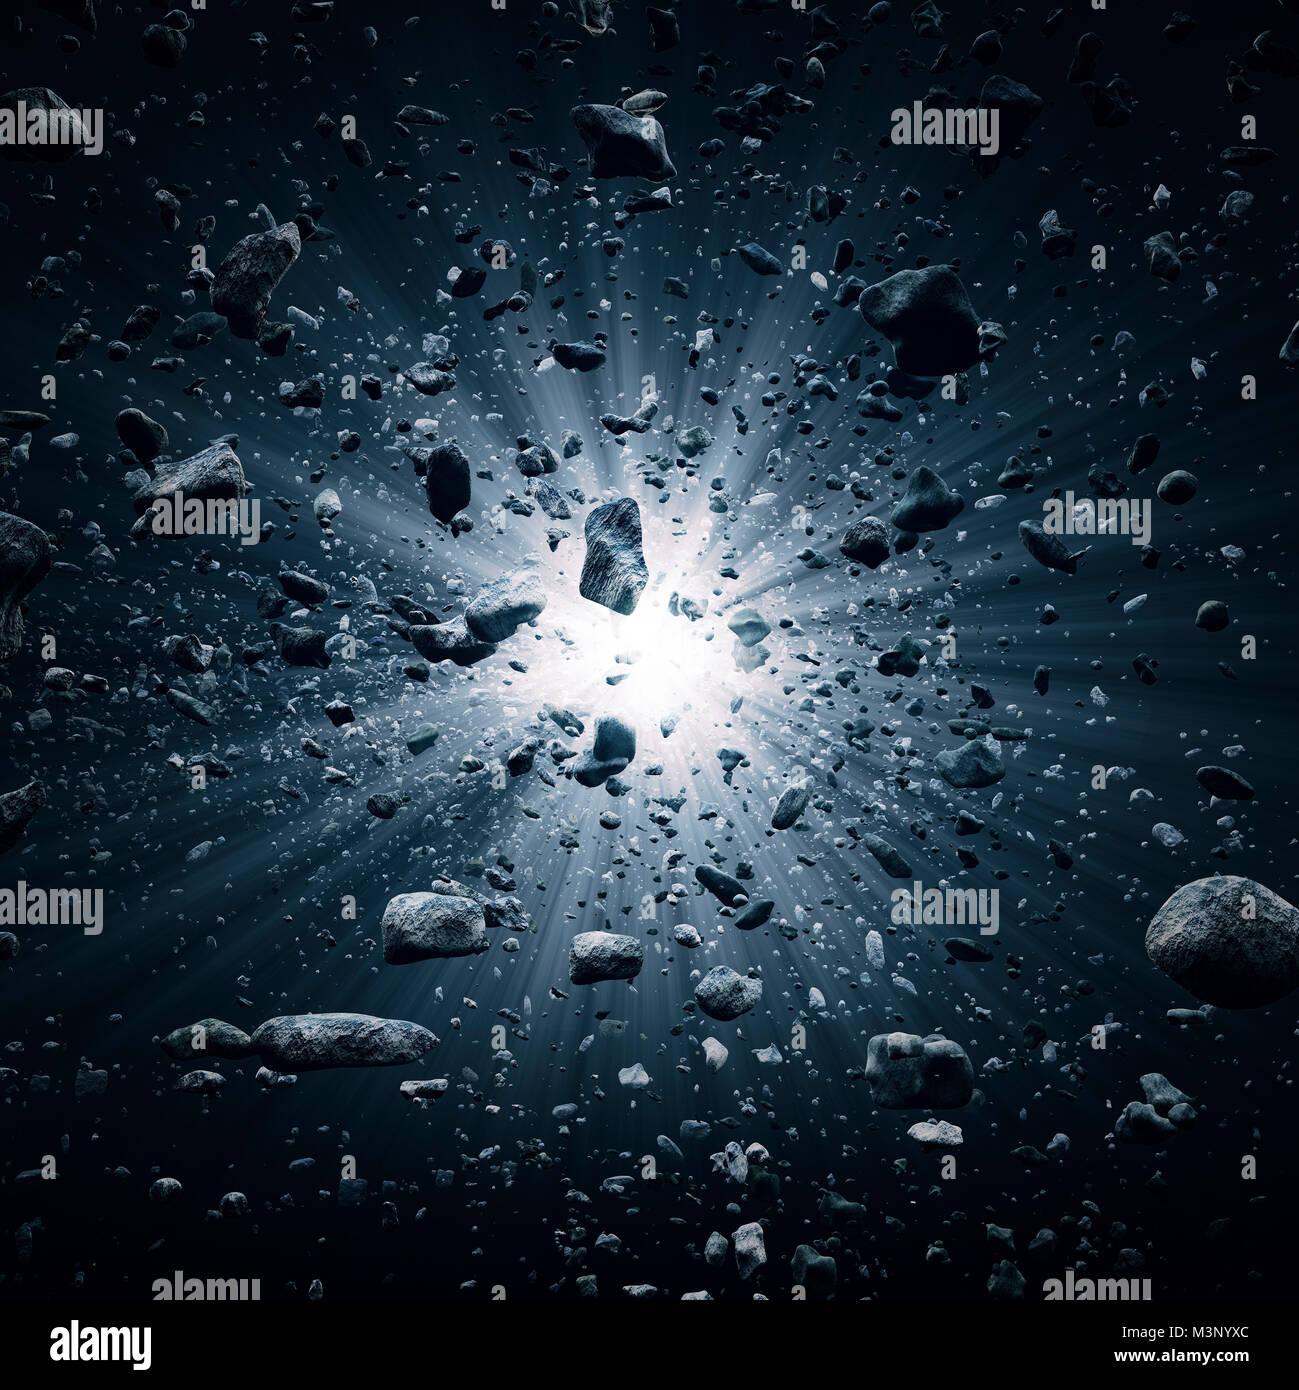 Rocks and debris flying through space after a huge big bang explosion (3D render) - Stock Image